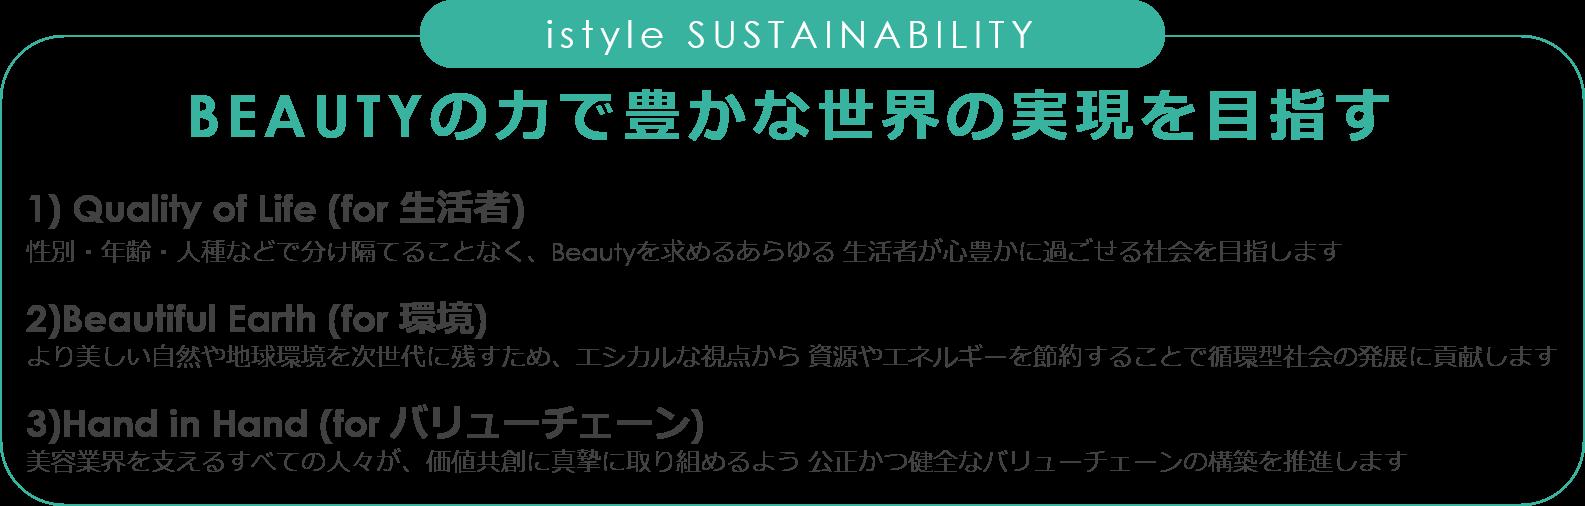 https://www.istyle.co.jp/news/uploads/196dd5508e453c3876f113993efc4d6ac5d80cc5.png